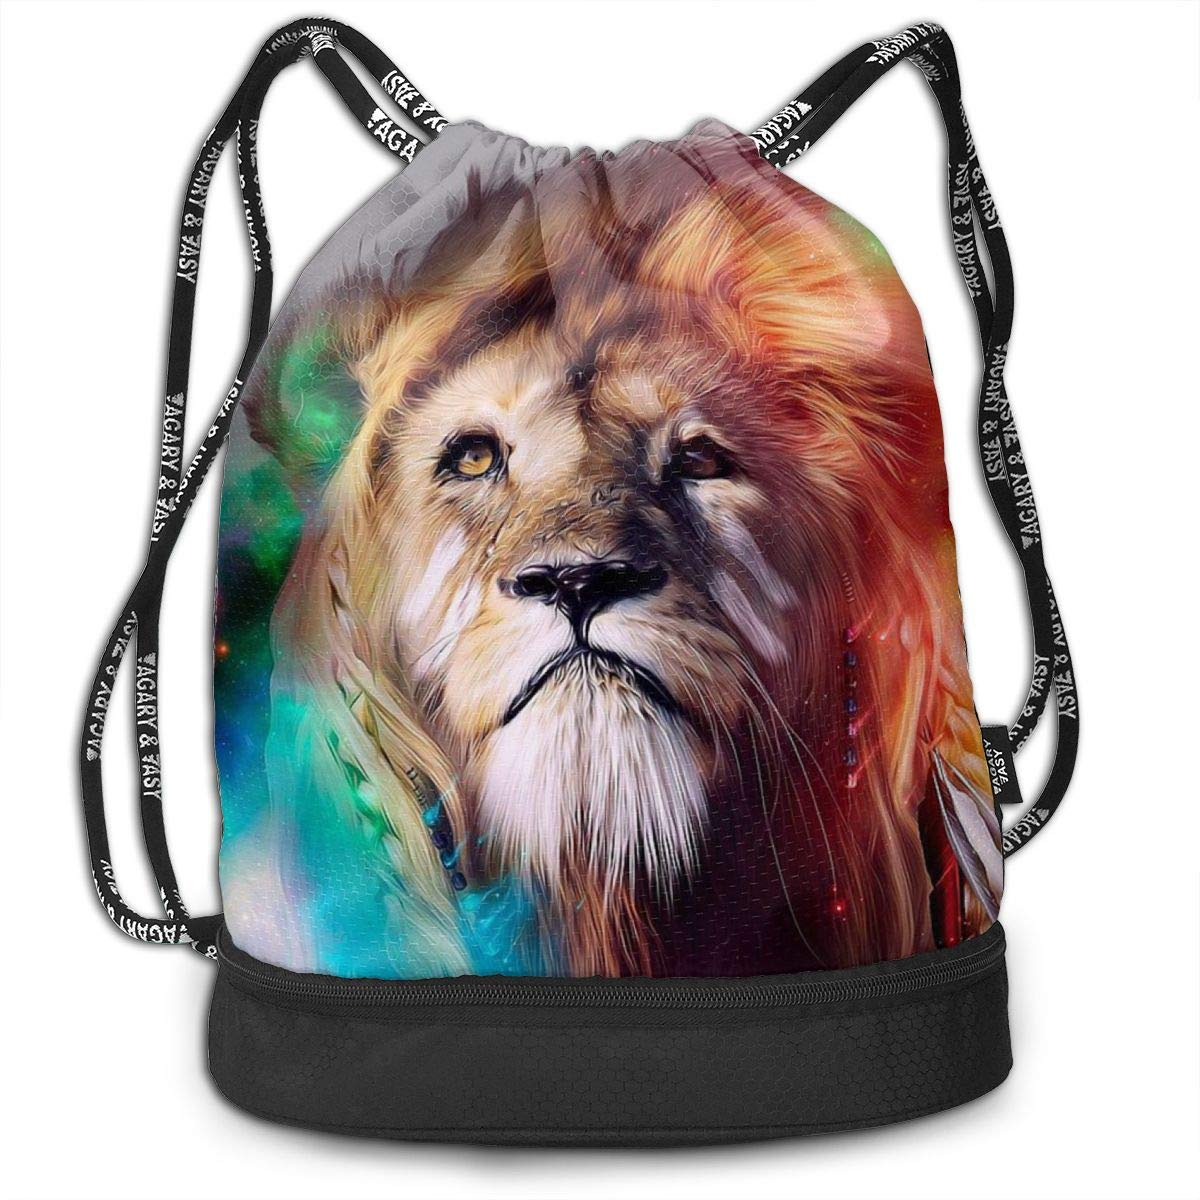 Cat Wearing Santa Hat Drawstring Bag For Girls /& Boys Portable Bundle Backpack Gym Yoga Runner Sports Daypack